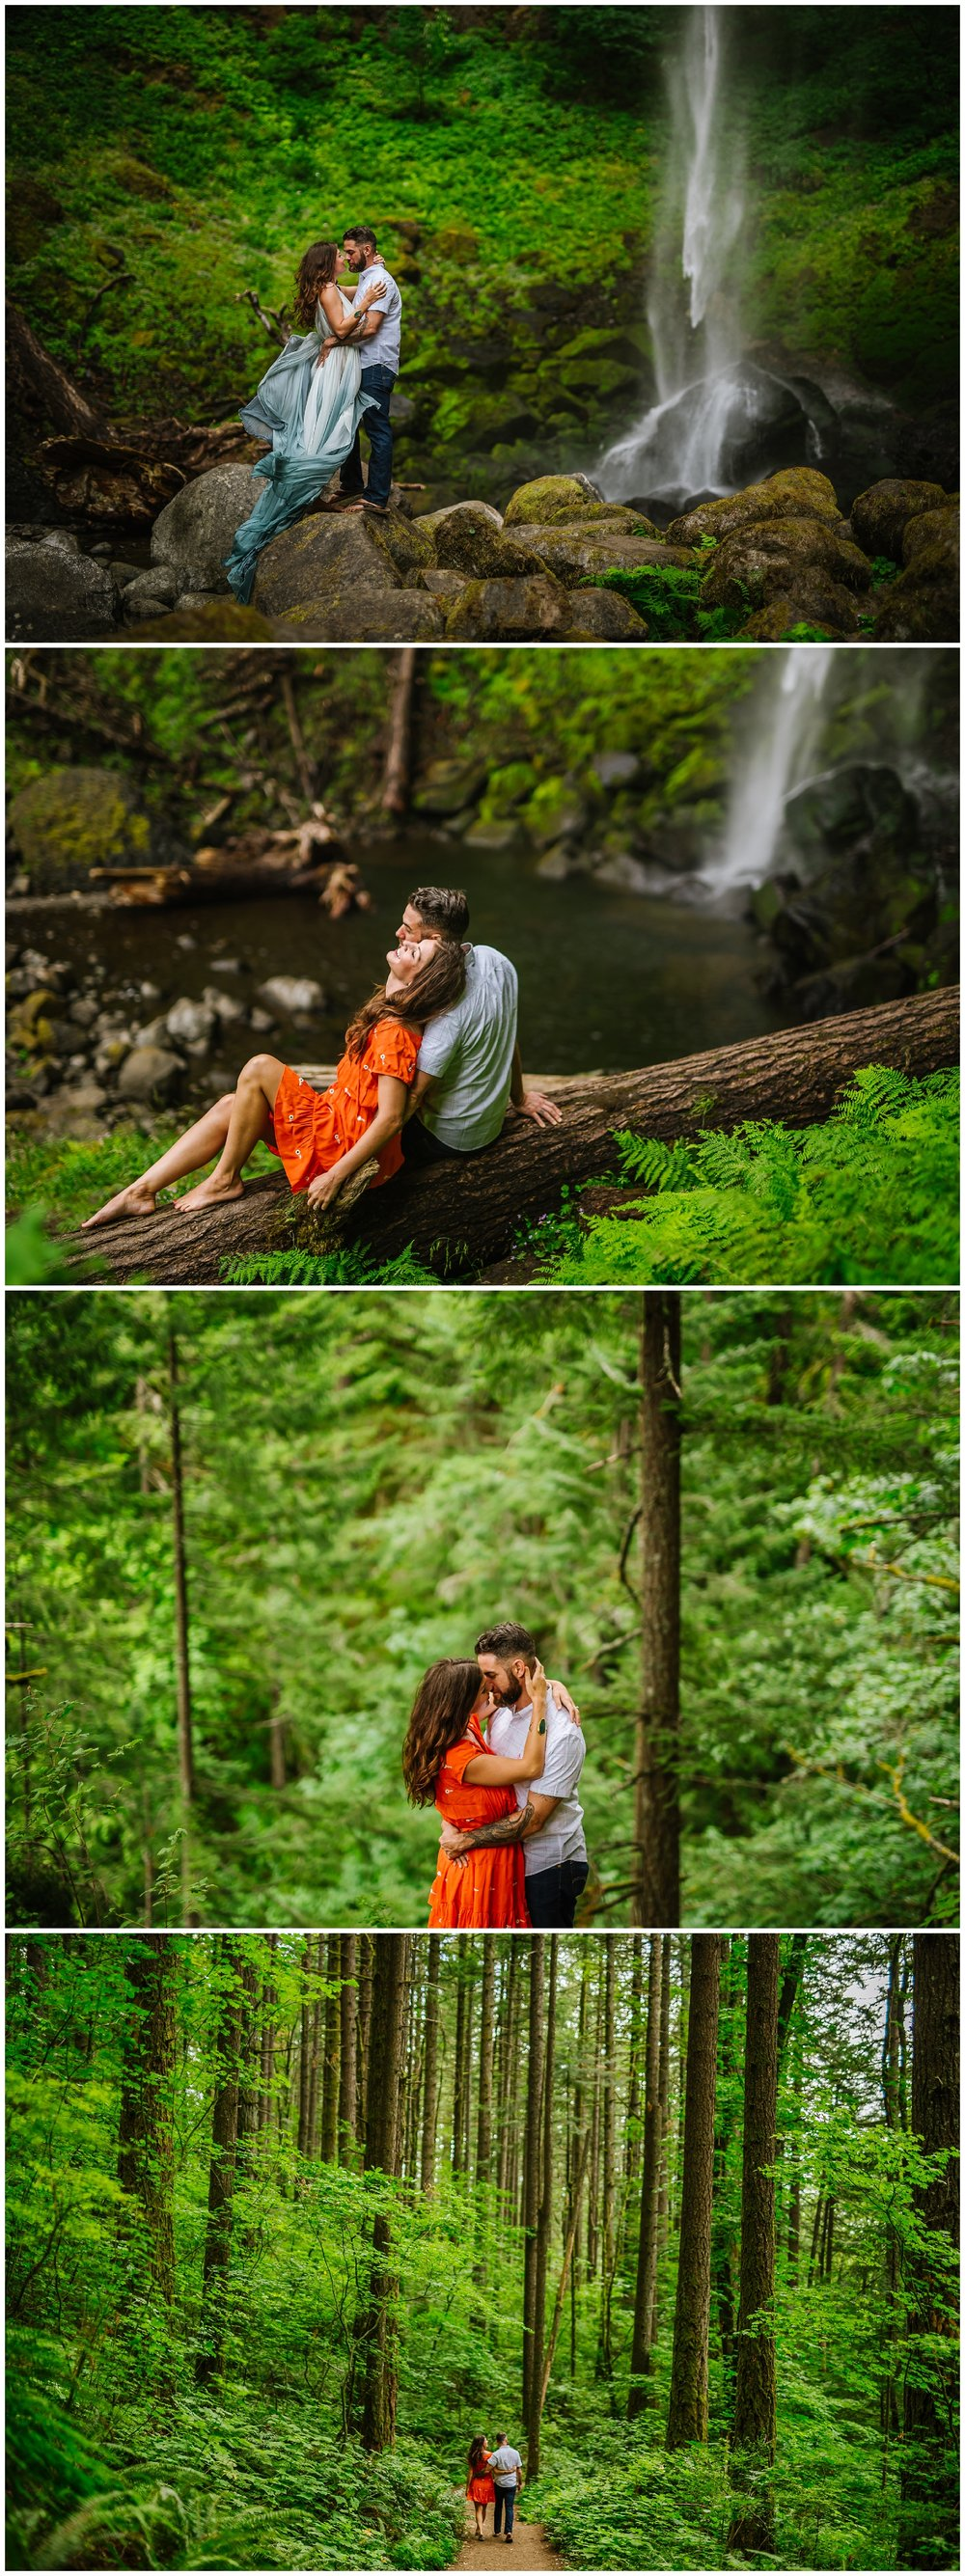 Ashlee-hamon-photography-year-in-review-2016-travel-wanderlust-vsco-adventure-wedding_0041.jpg